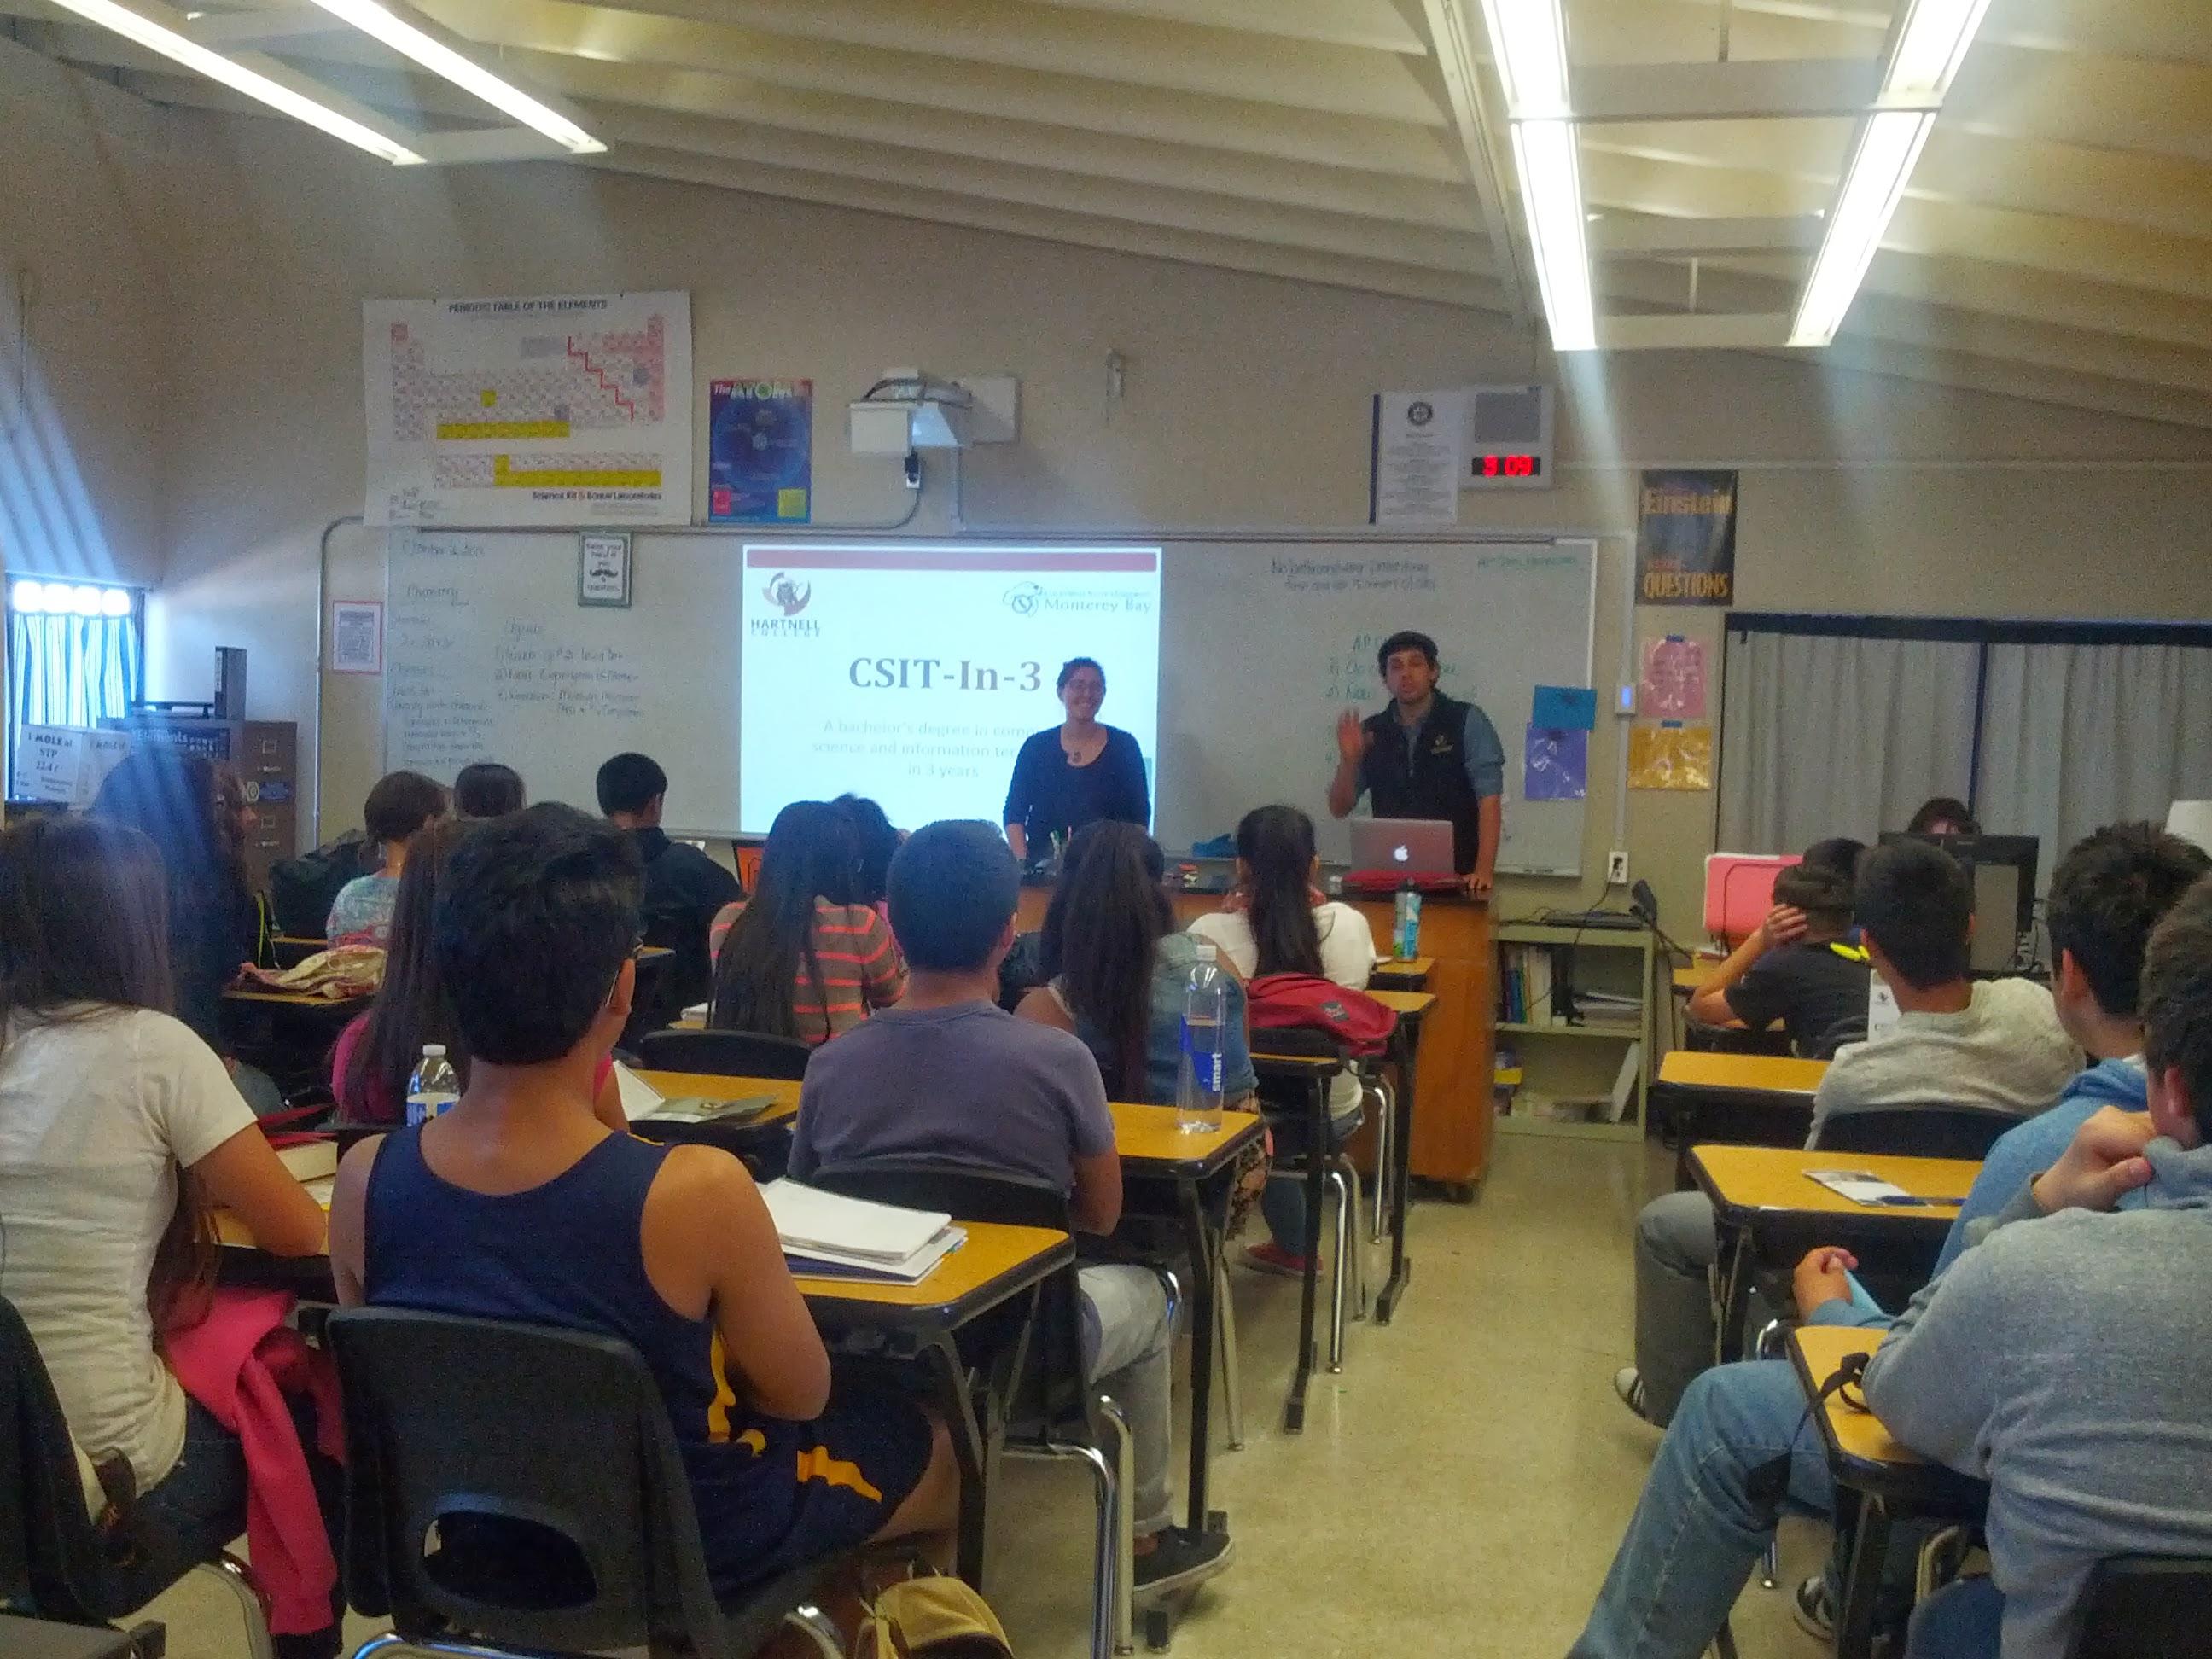 CSIT-in-3 Presentation